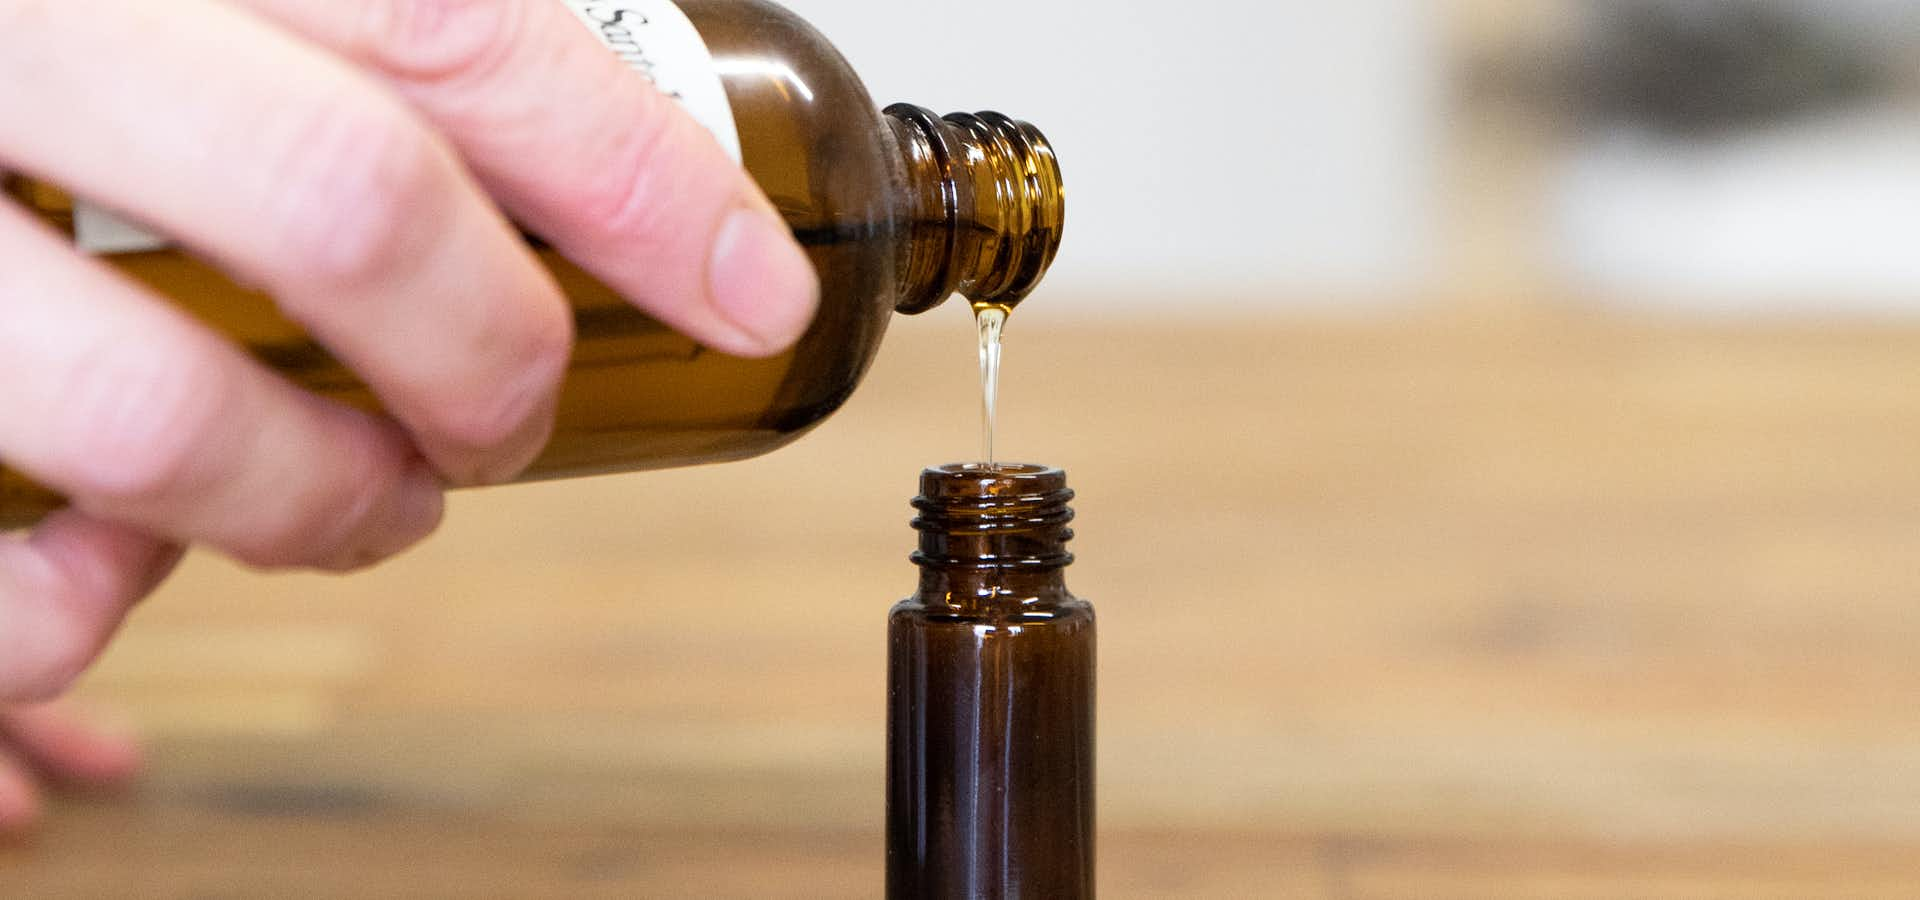 Essential oils mix